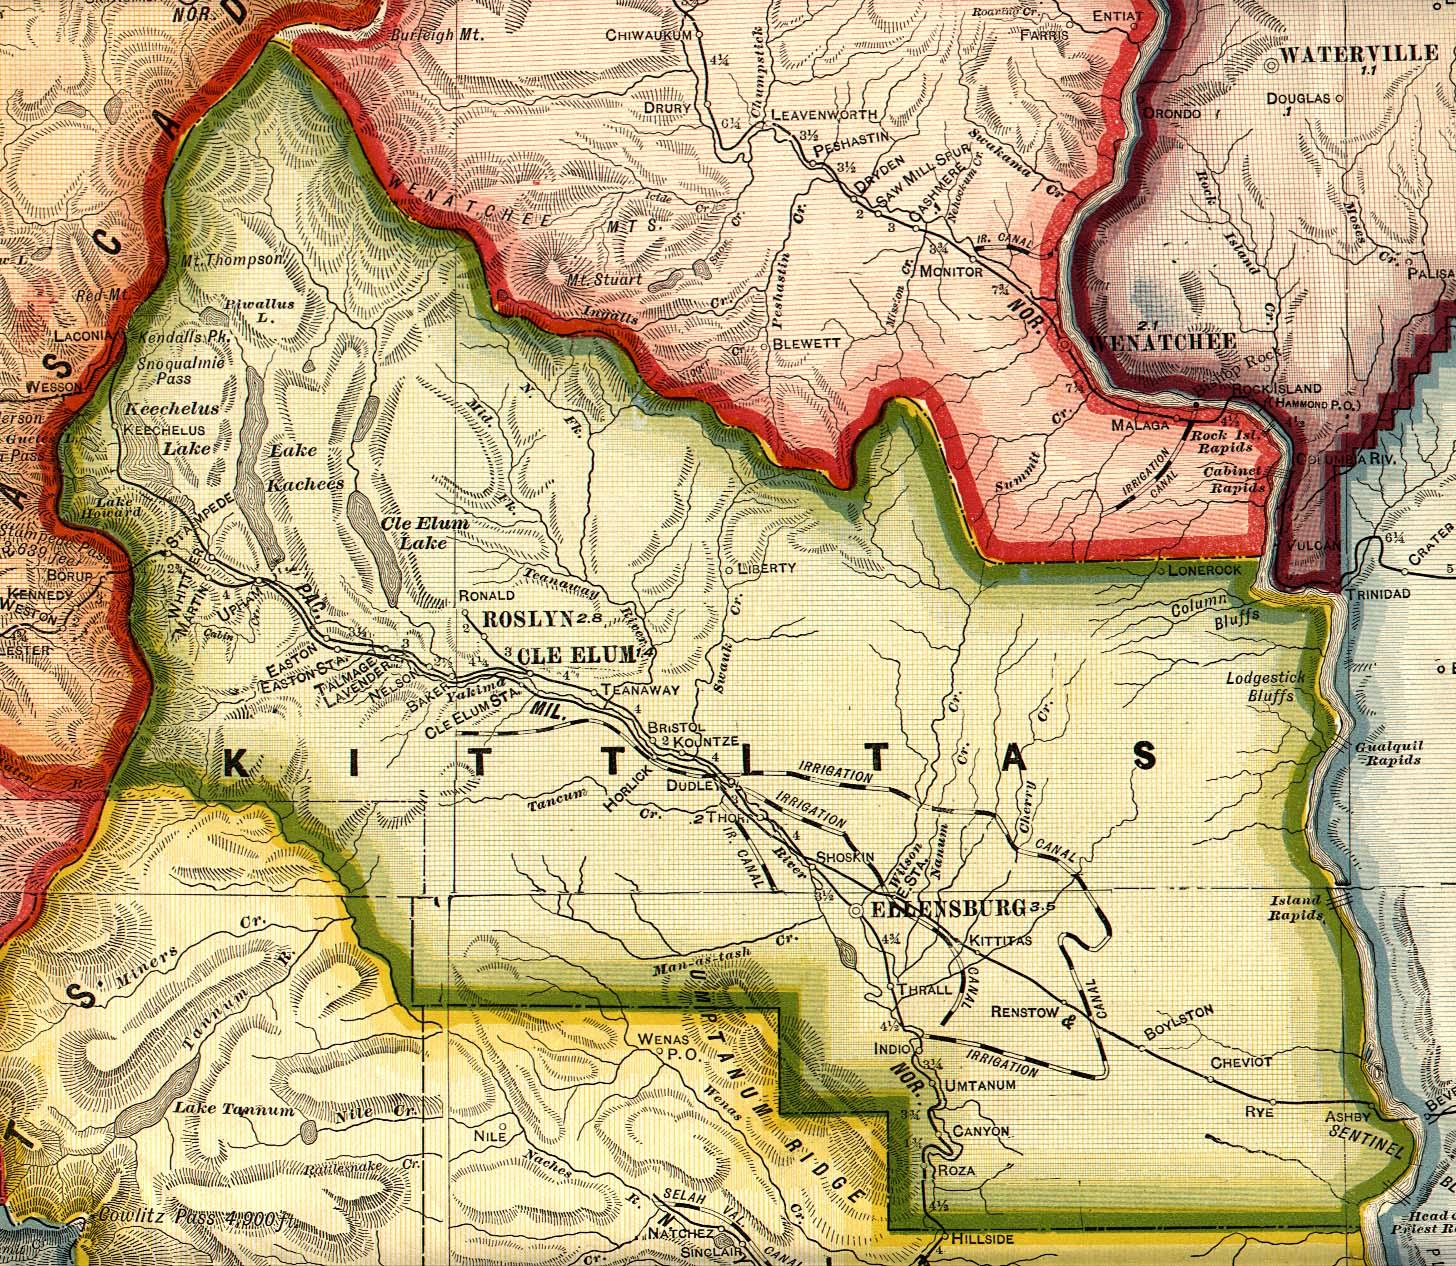 Kittitas County, Washington Maps and Gazetteers